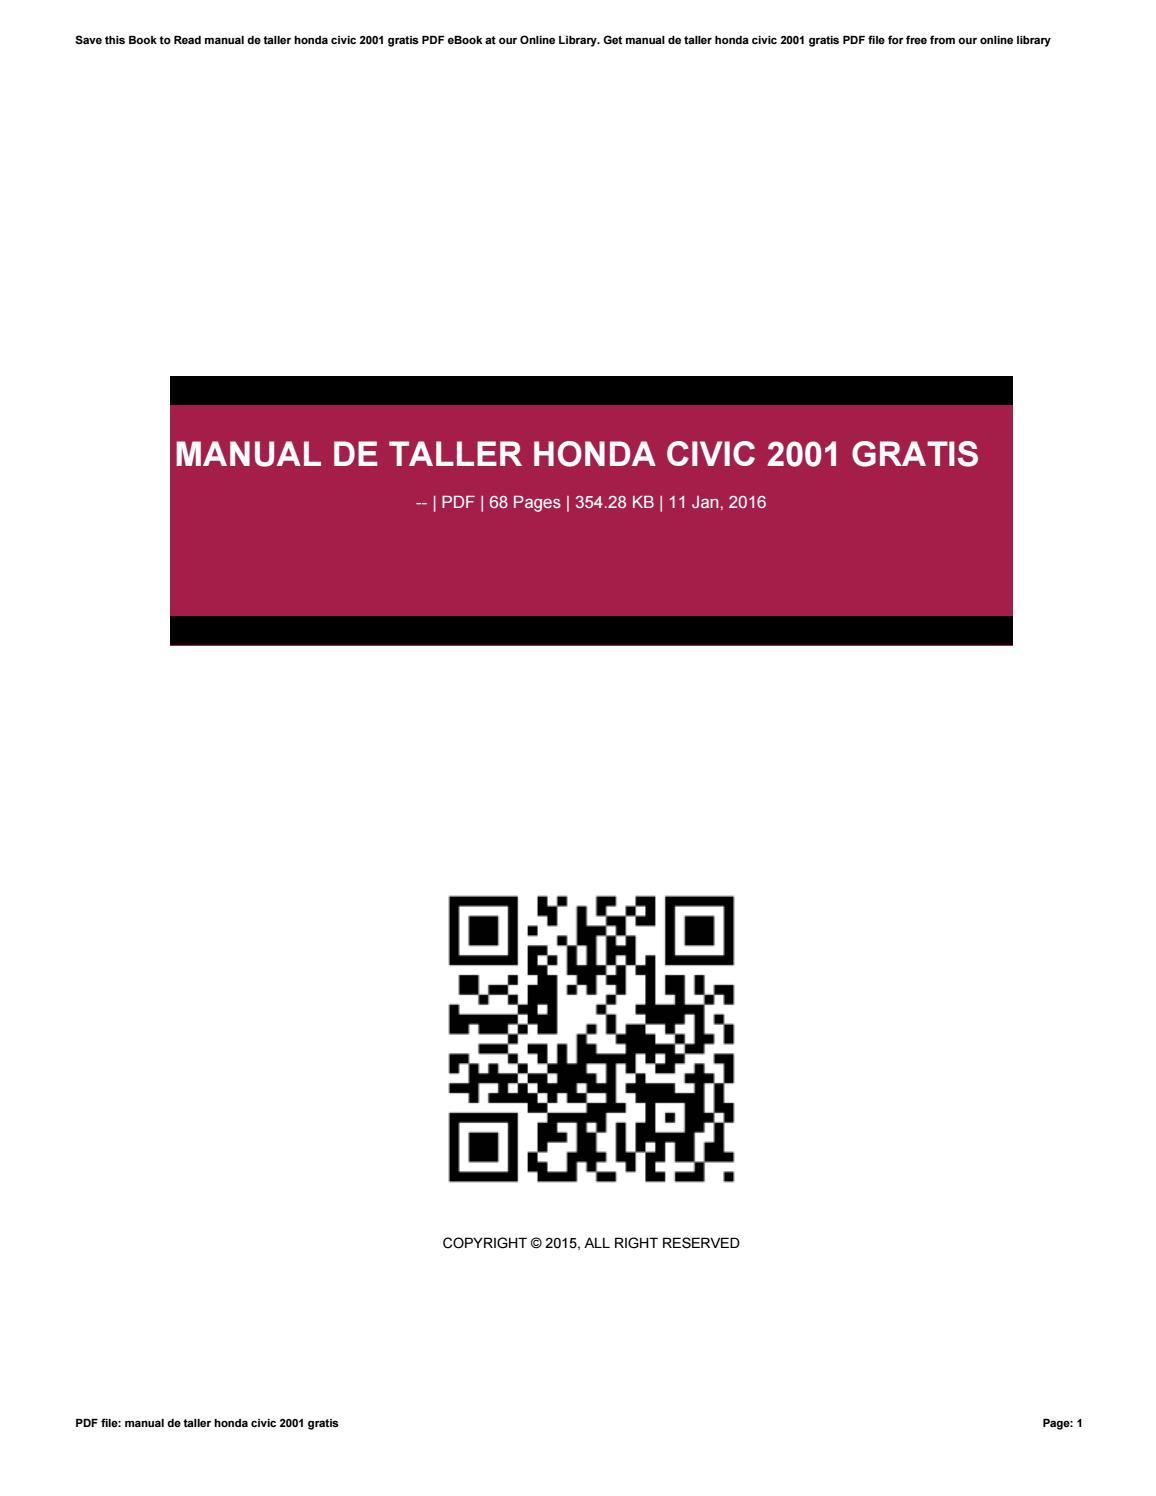 2001 civic manual pdf